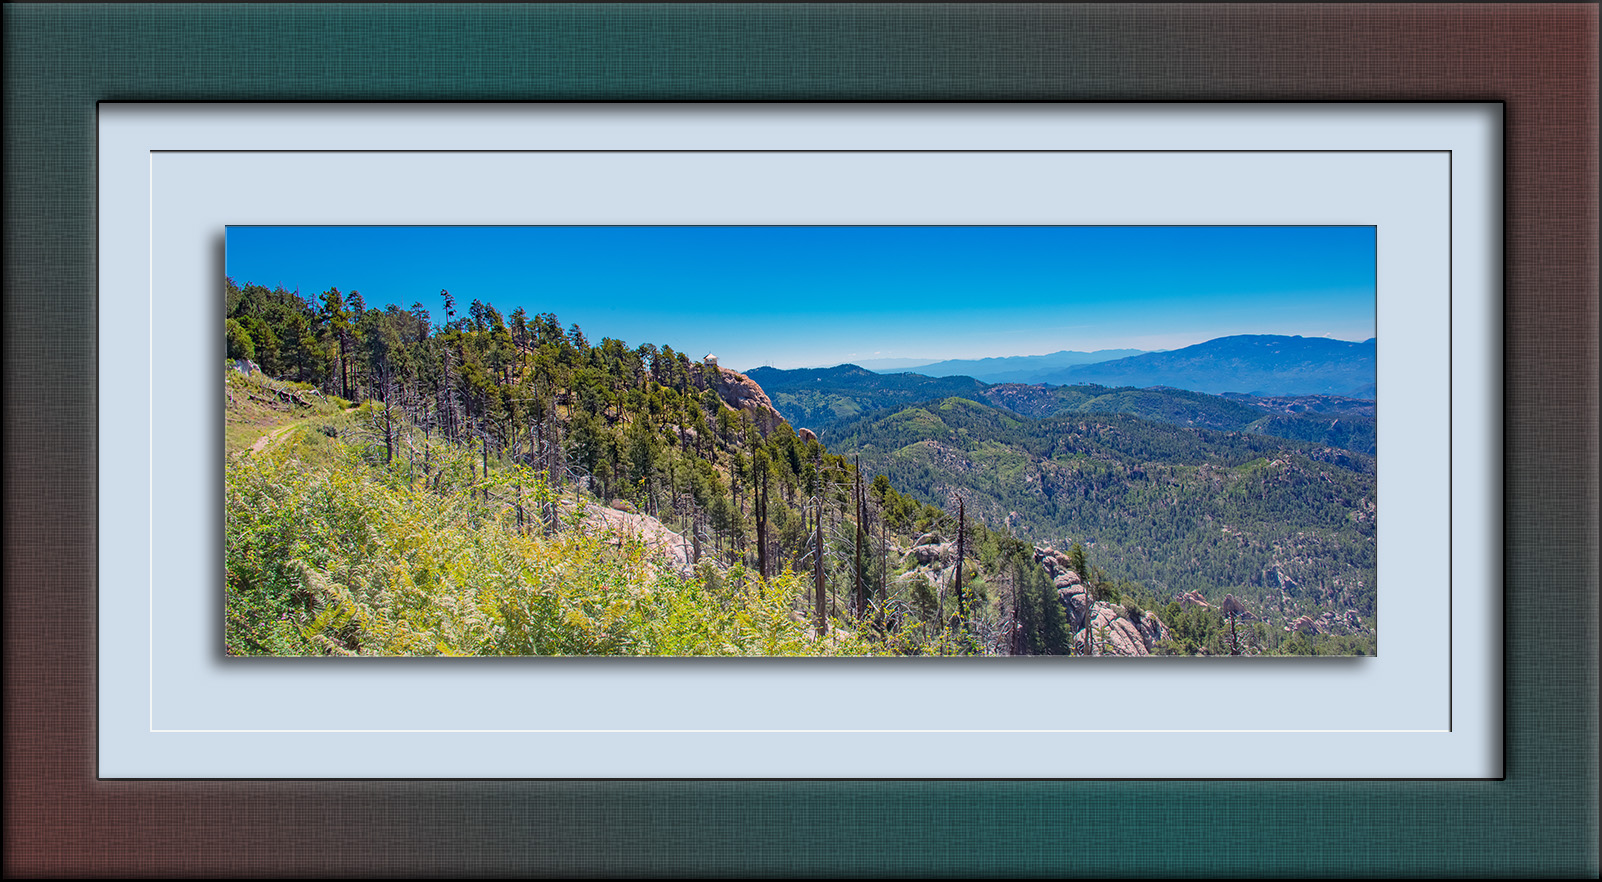 Lemmon Rock Lookout Tower-3183 blog